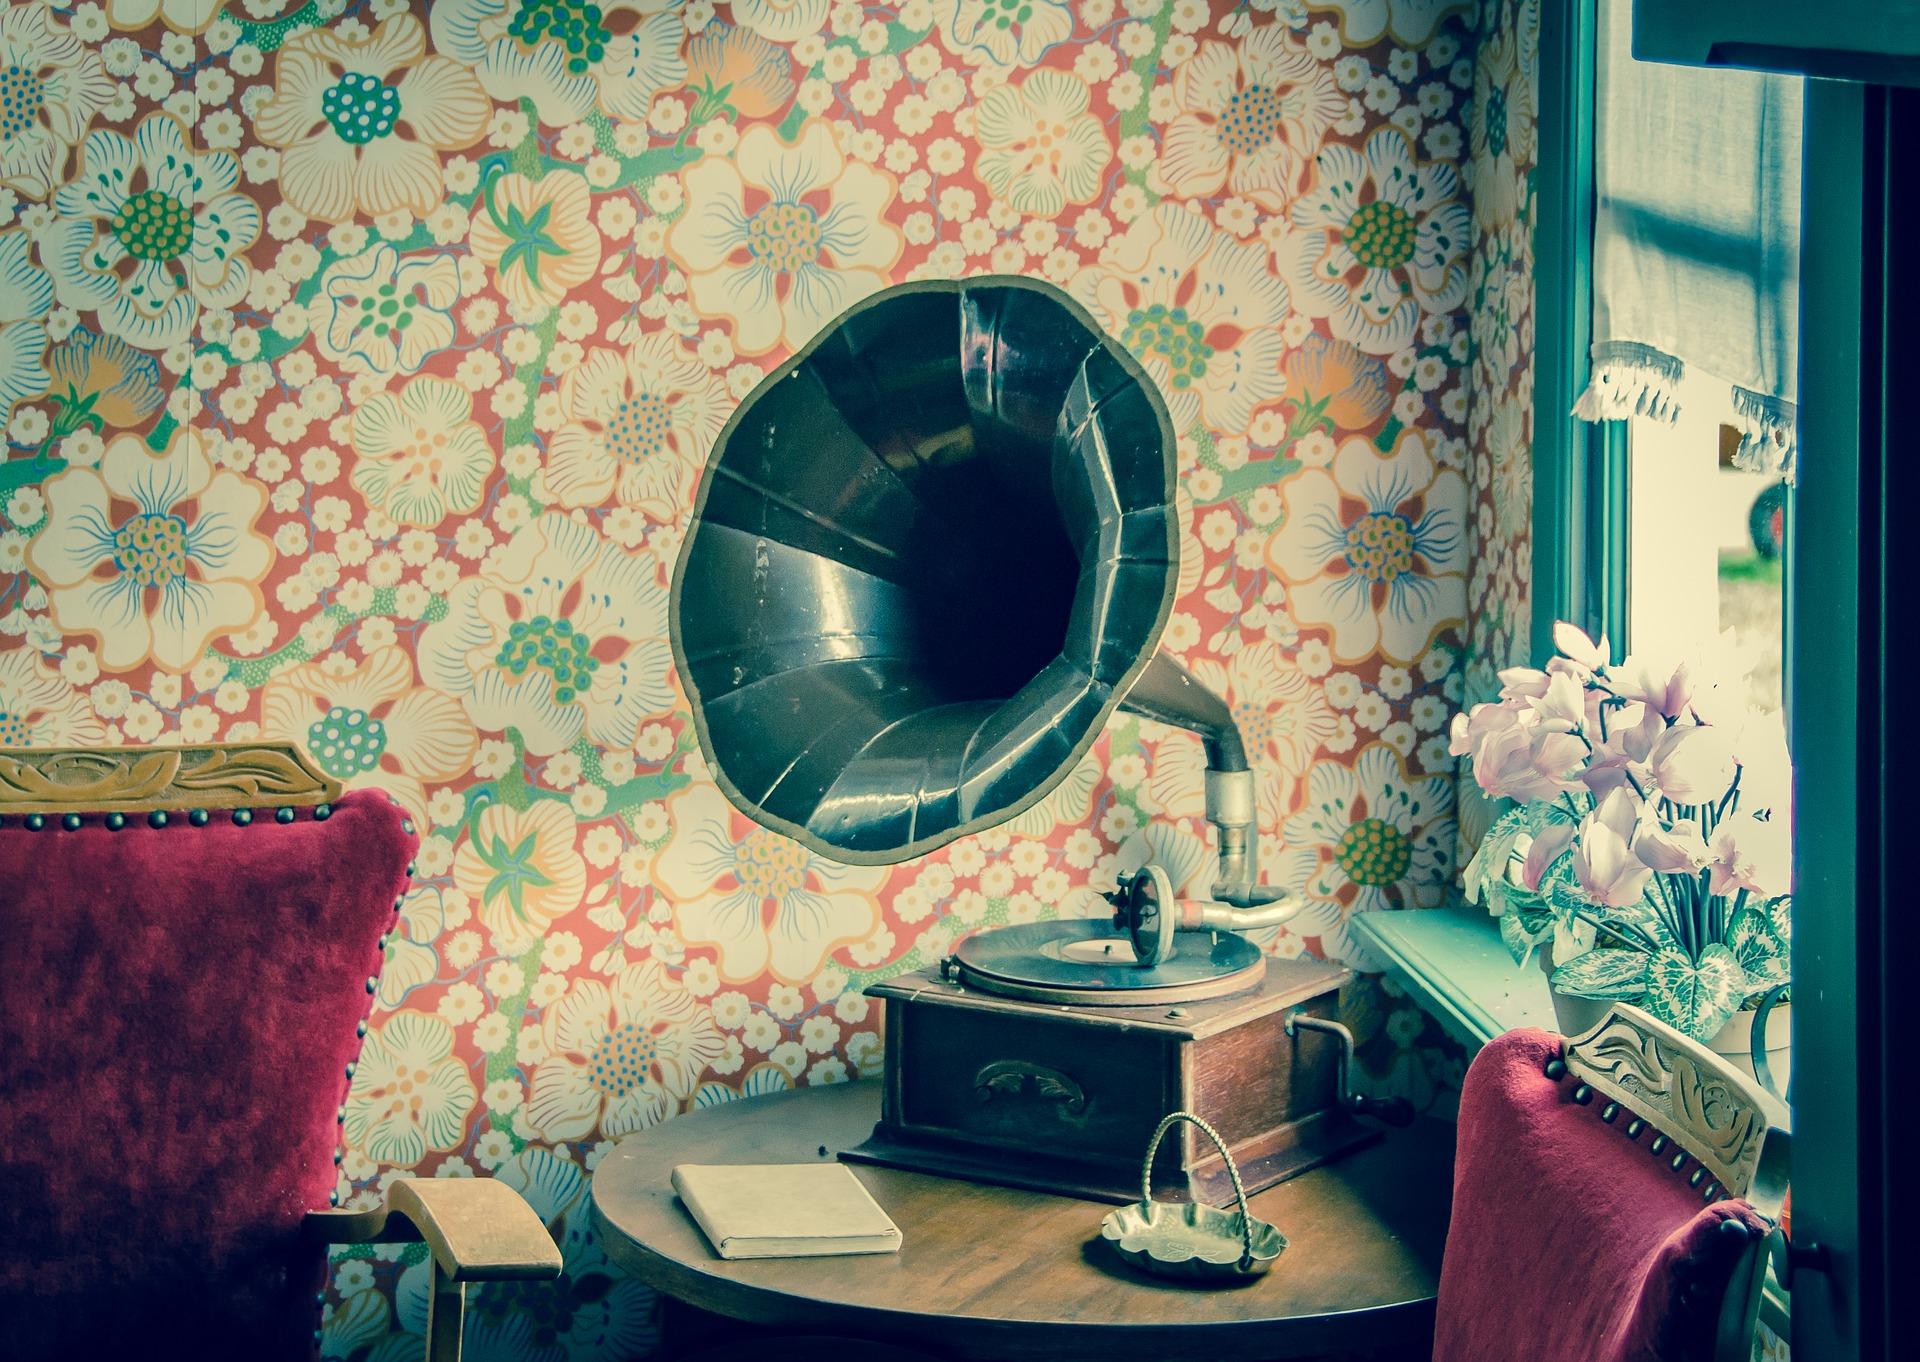 vinyl-2786526_1920